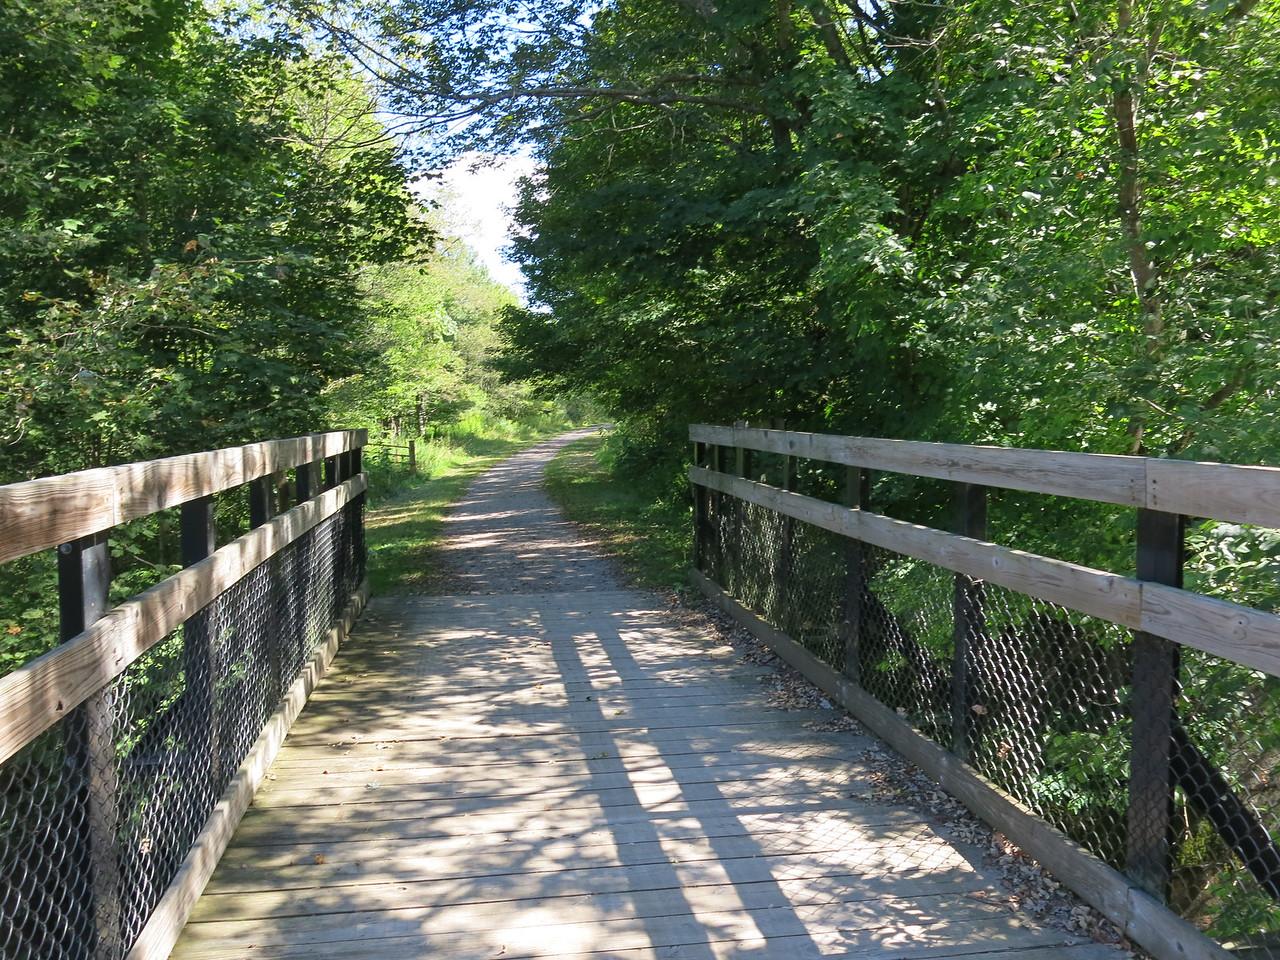 One more bridge